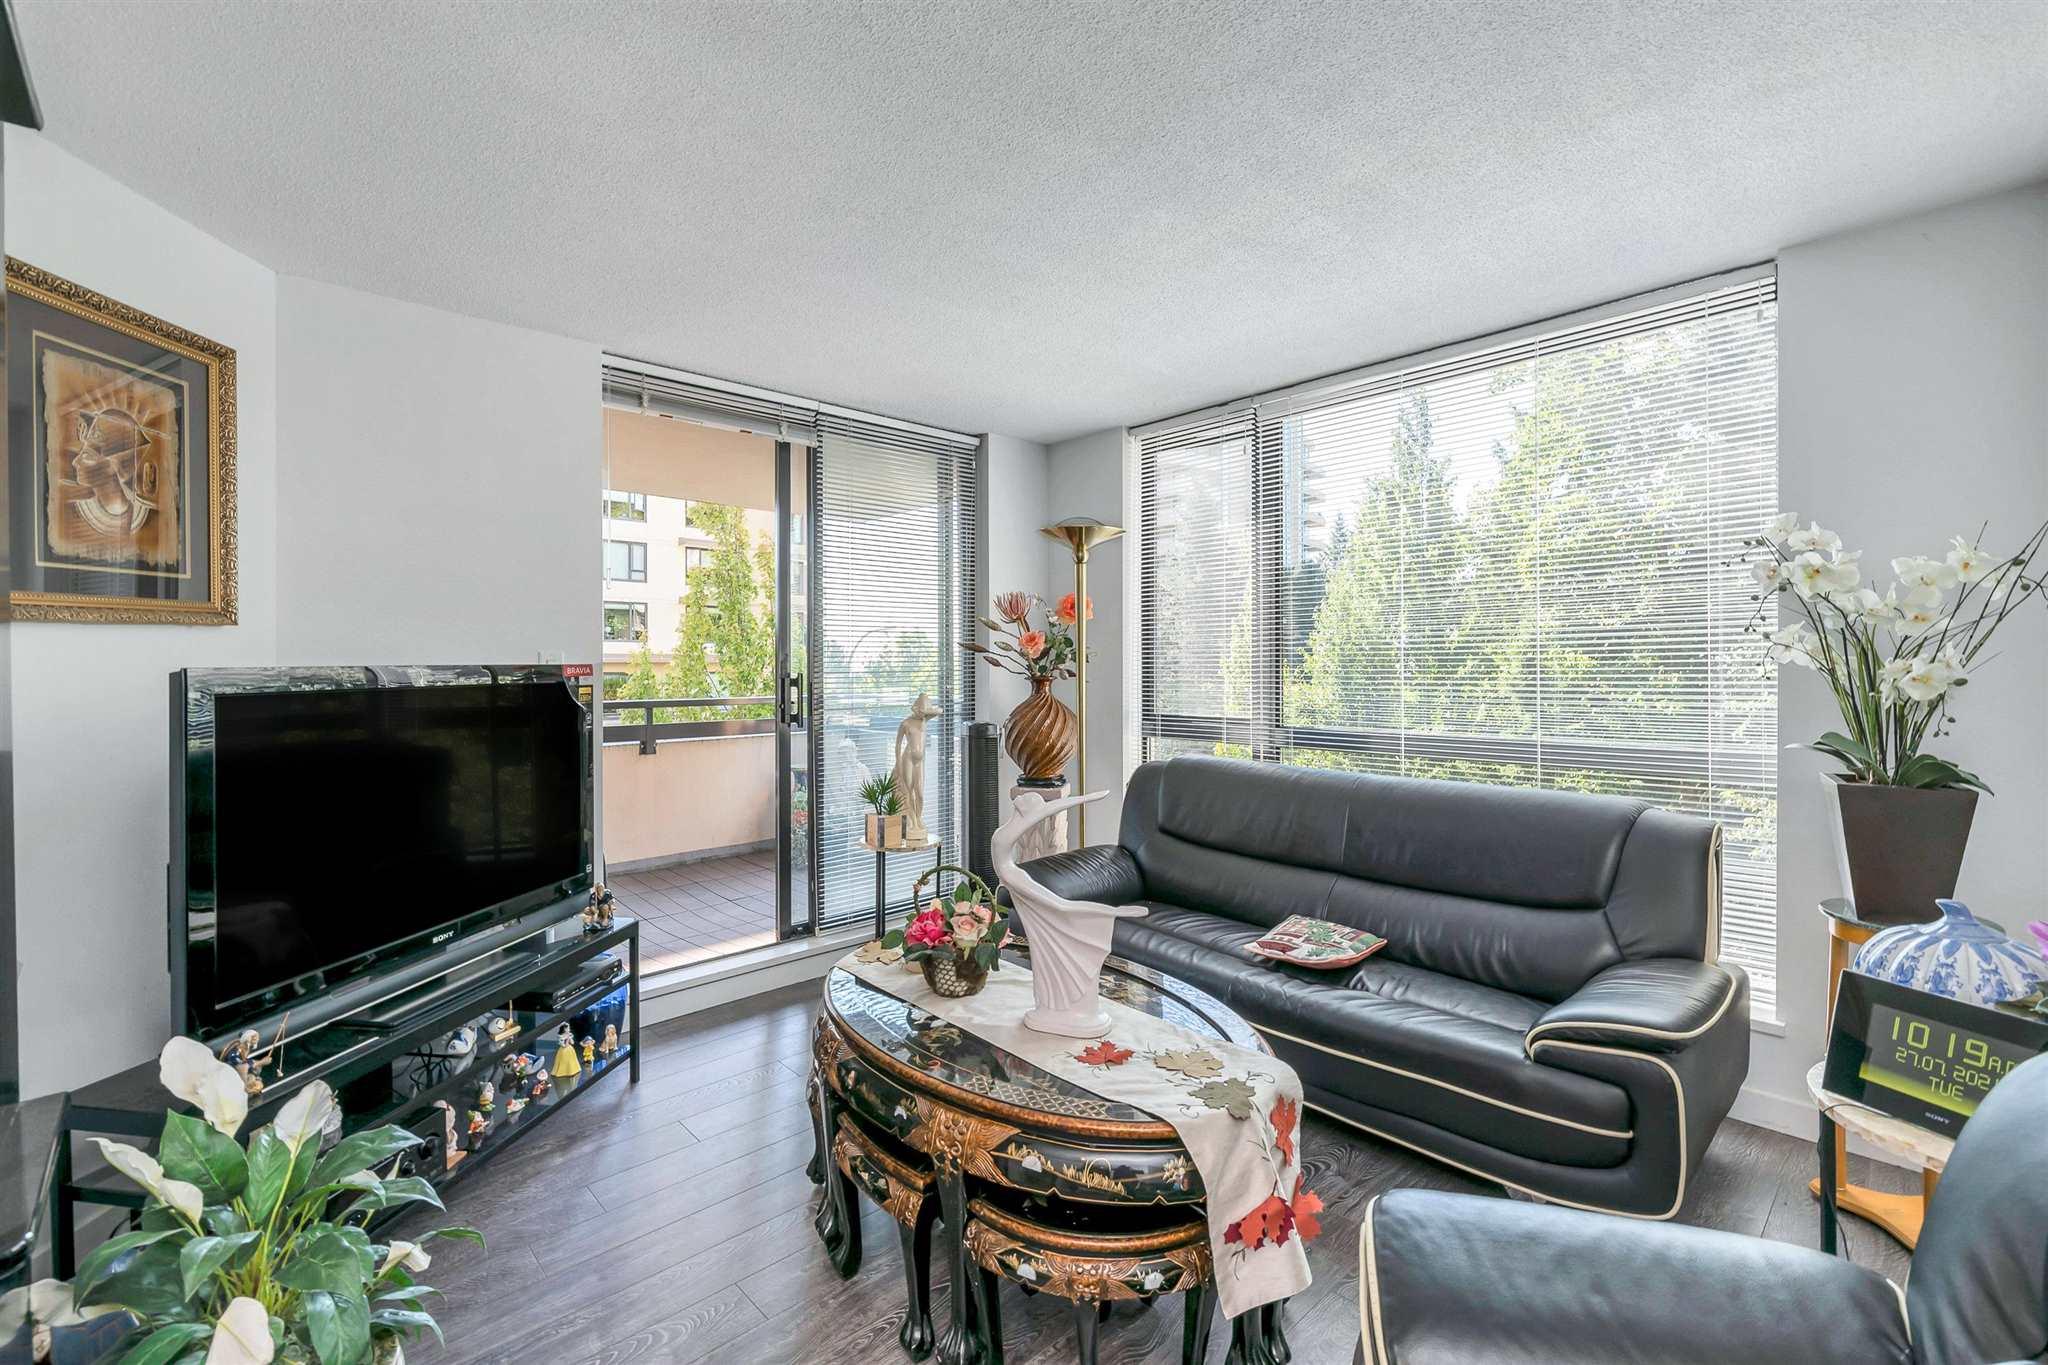 205 7225 ACORN AVENUE - Highgate Apartment/Condo for sale, 2 Bedrooms (R2606454) - #9